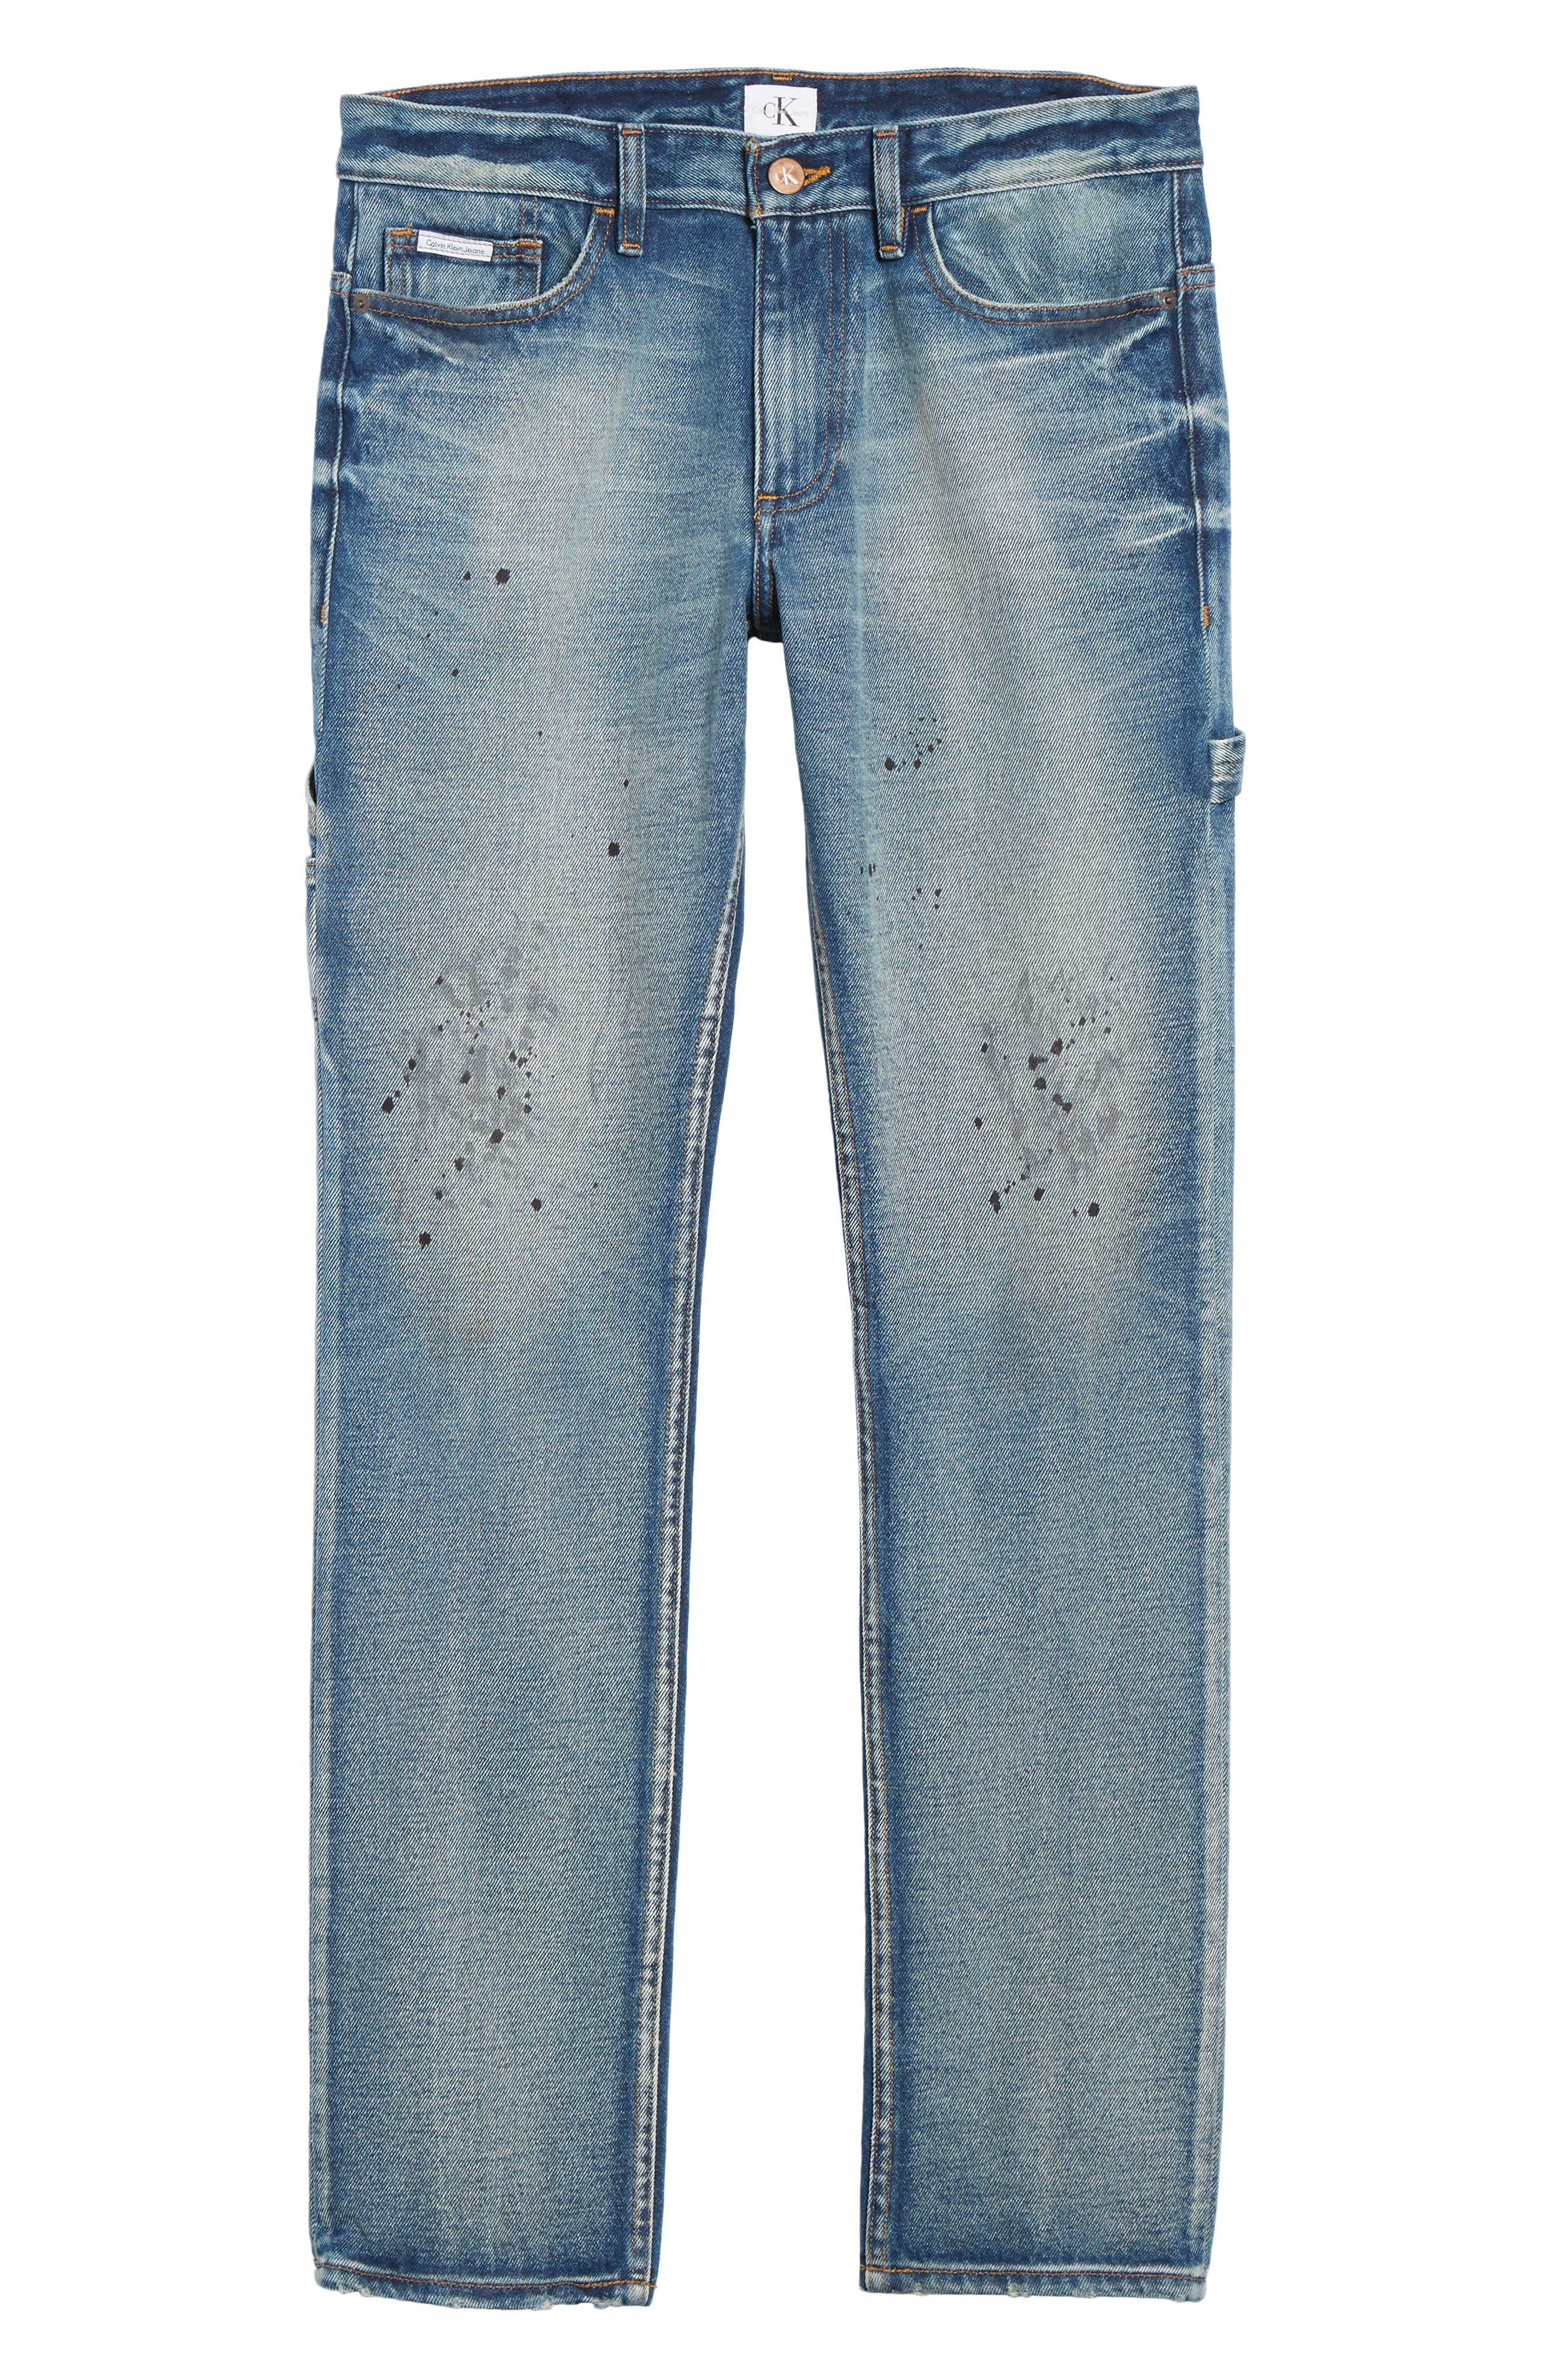 Carpenter Slim Fit Jeans,                             Alternate thumbnail 6, color,                             492